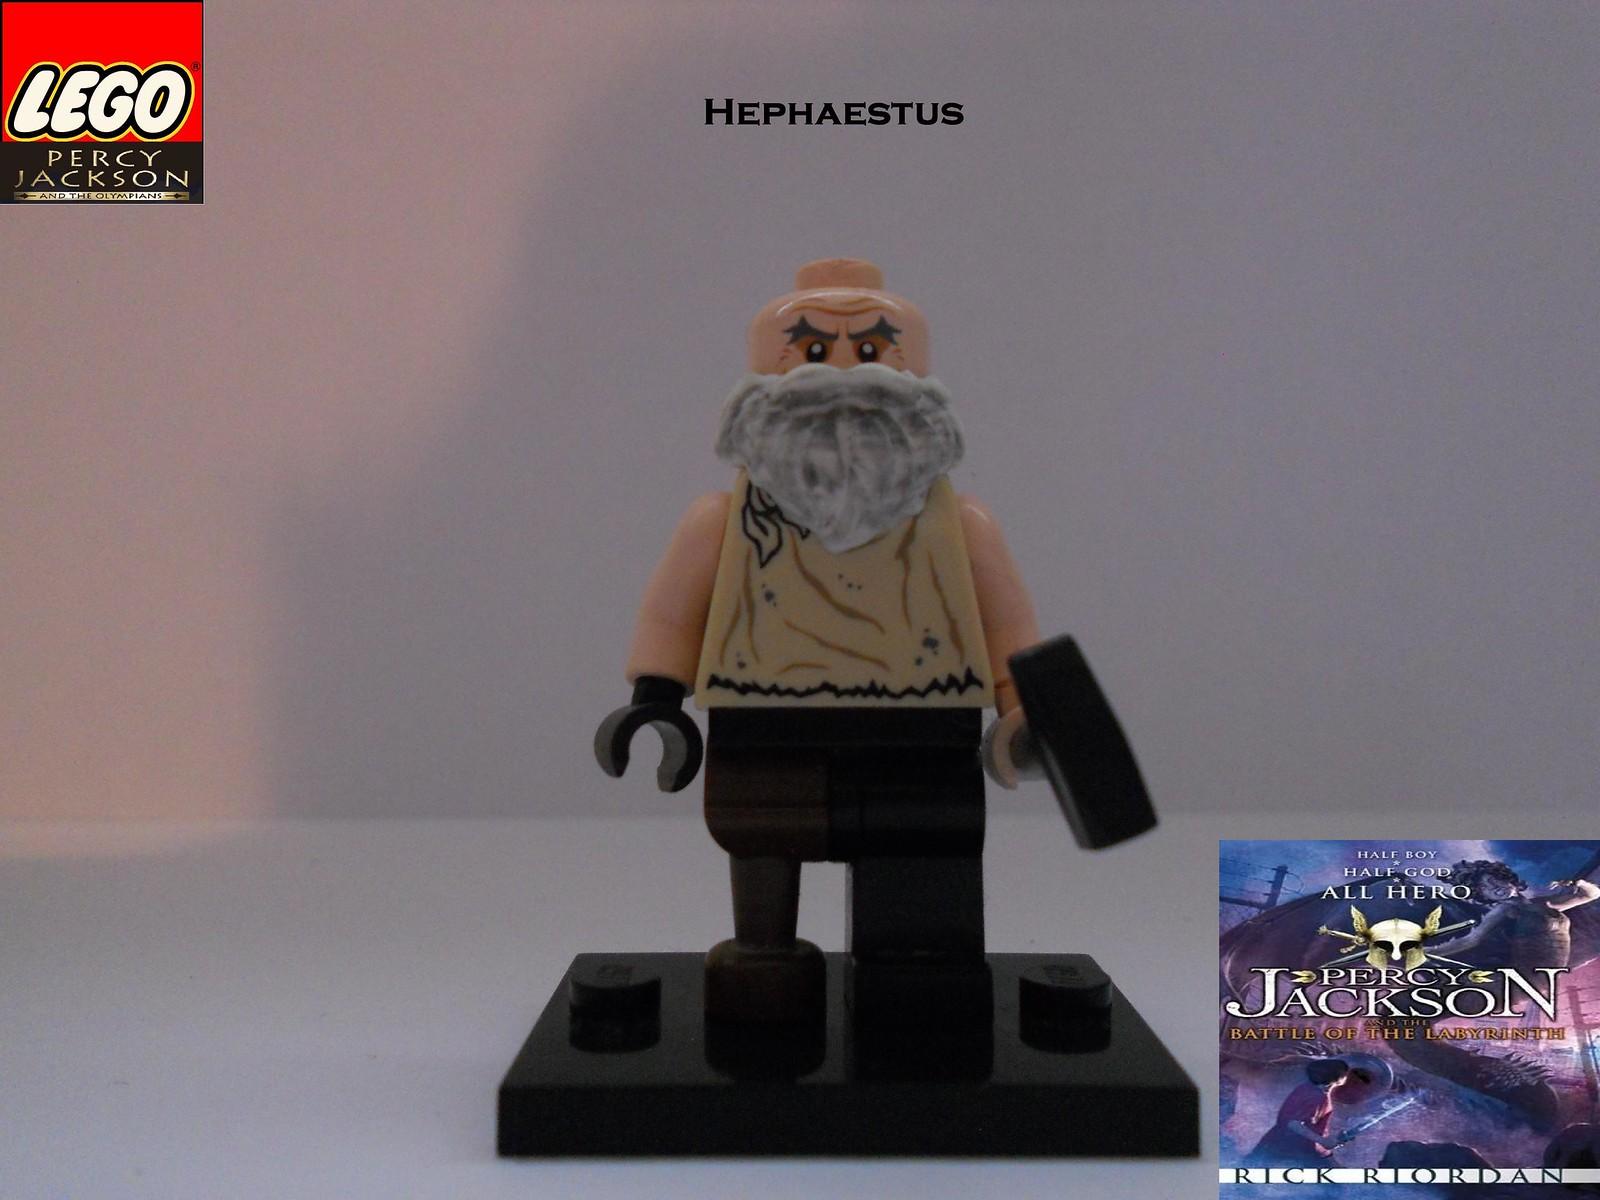 Hephaestus Percy Jackson Percy jackson hephaestusQuintus Percy Jackson